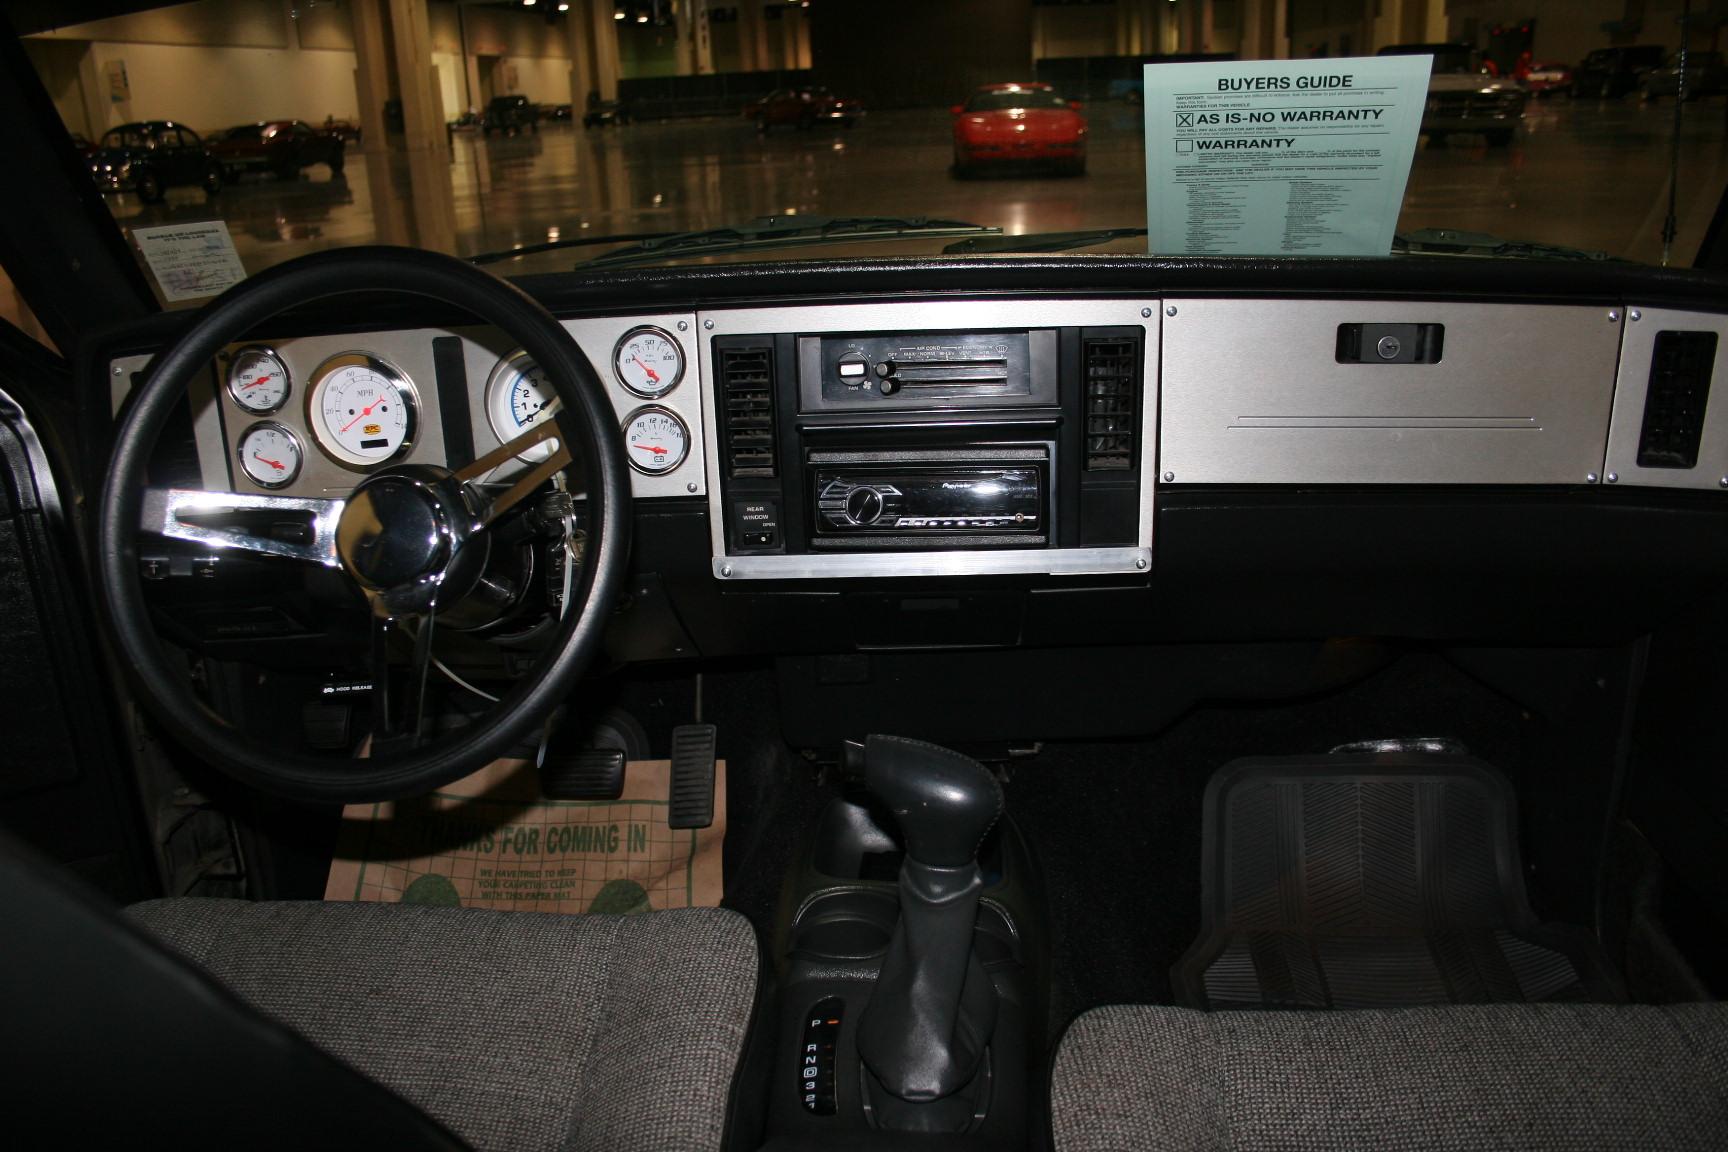 1985 GMC JIMMY S15 For Sale at Vicari Auctions Biloxi, 2018